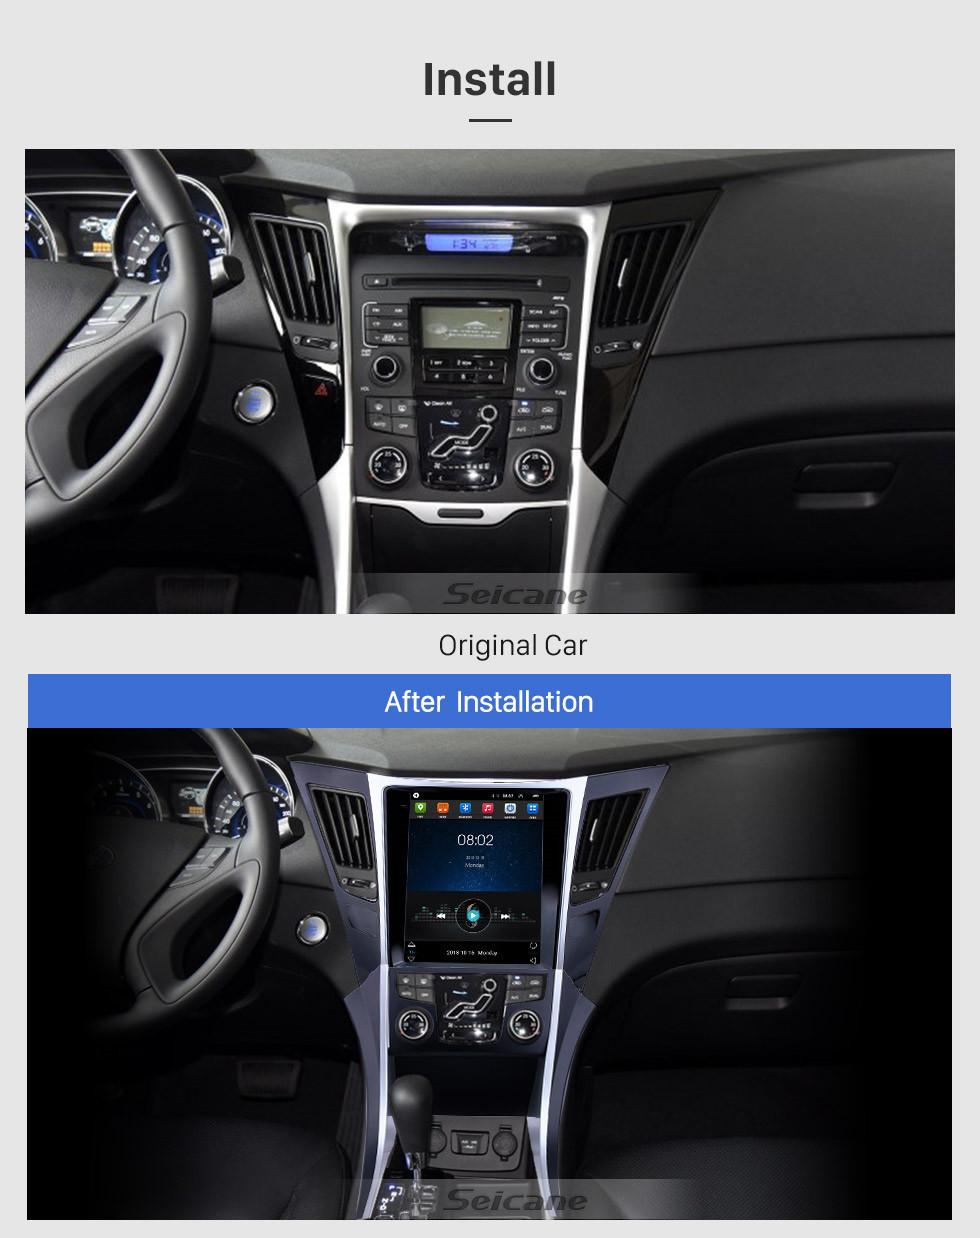 Seicane HD Touchscreen 2011-2015 Hyundai Sonata Android 9.1 9.7 inch GPS Navigation Radio Bluetooth WIFI support DAB+ Steering Wheel Control Carplay